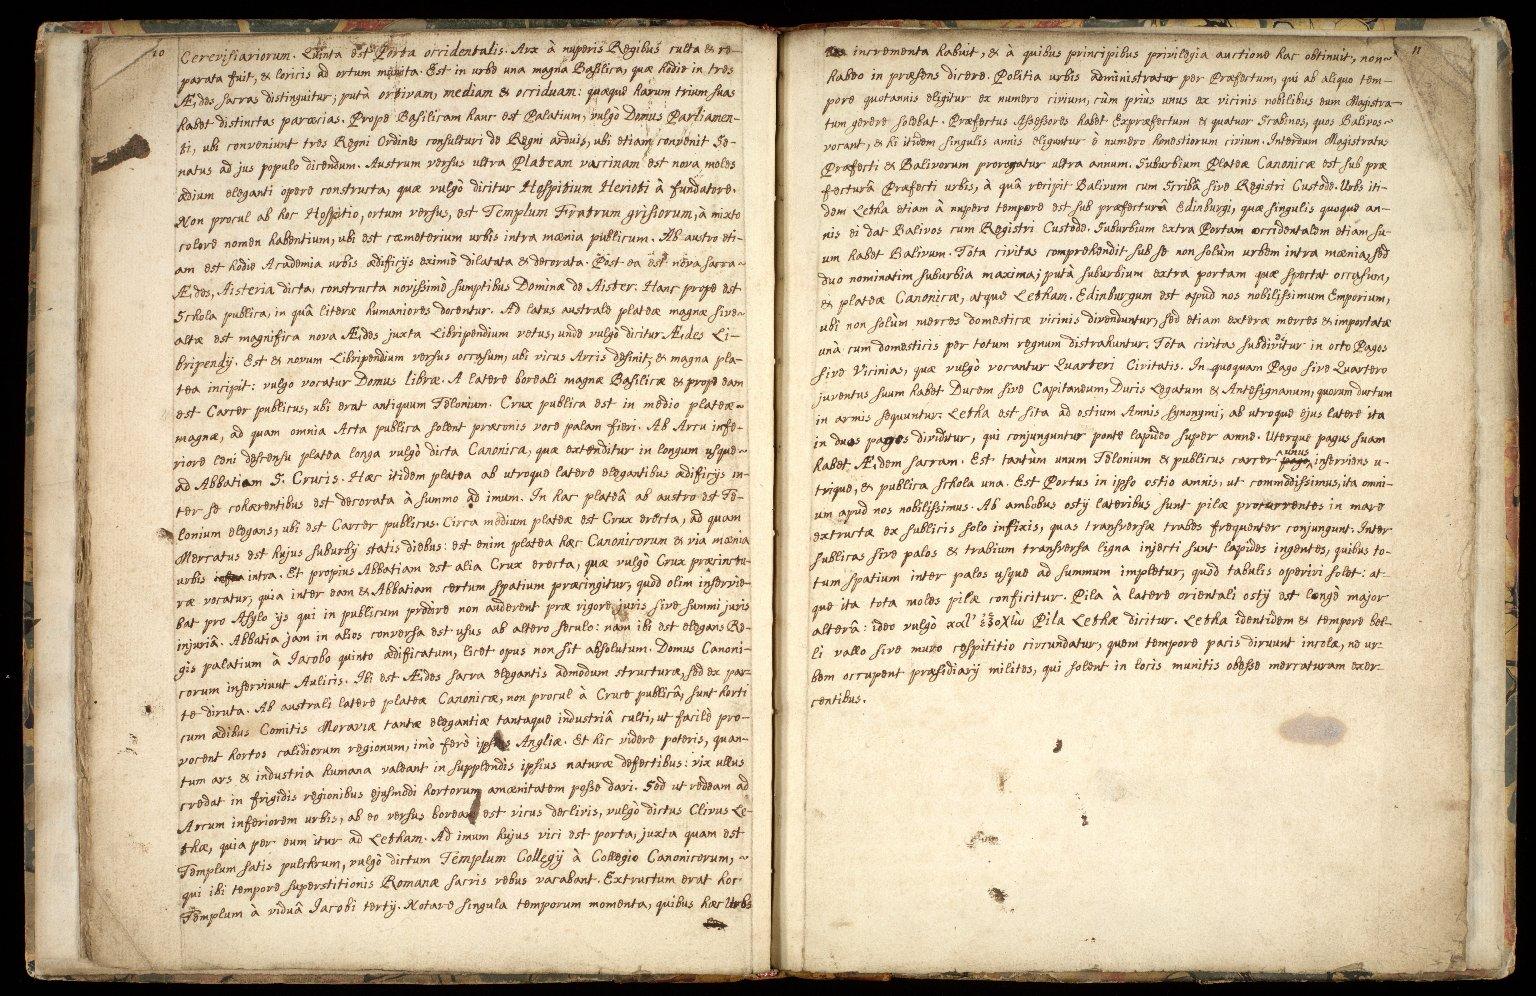 Provincia Edinburgena descriptio. [7 of 7]